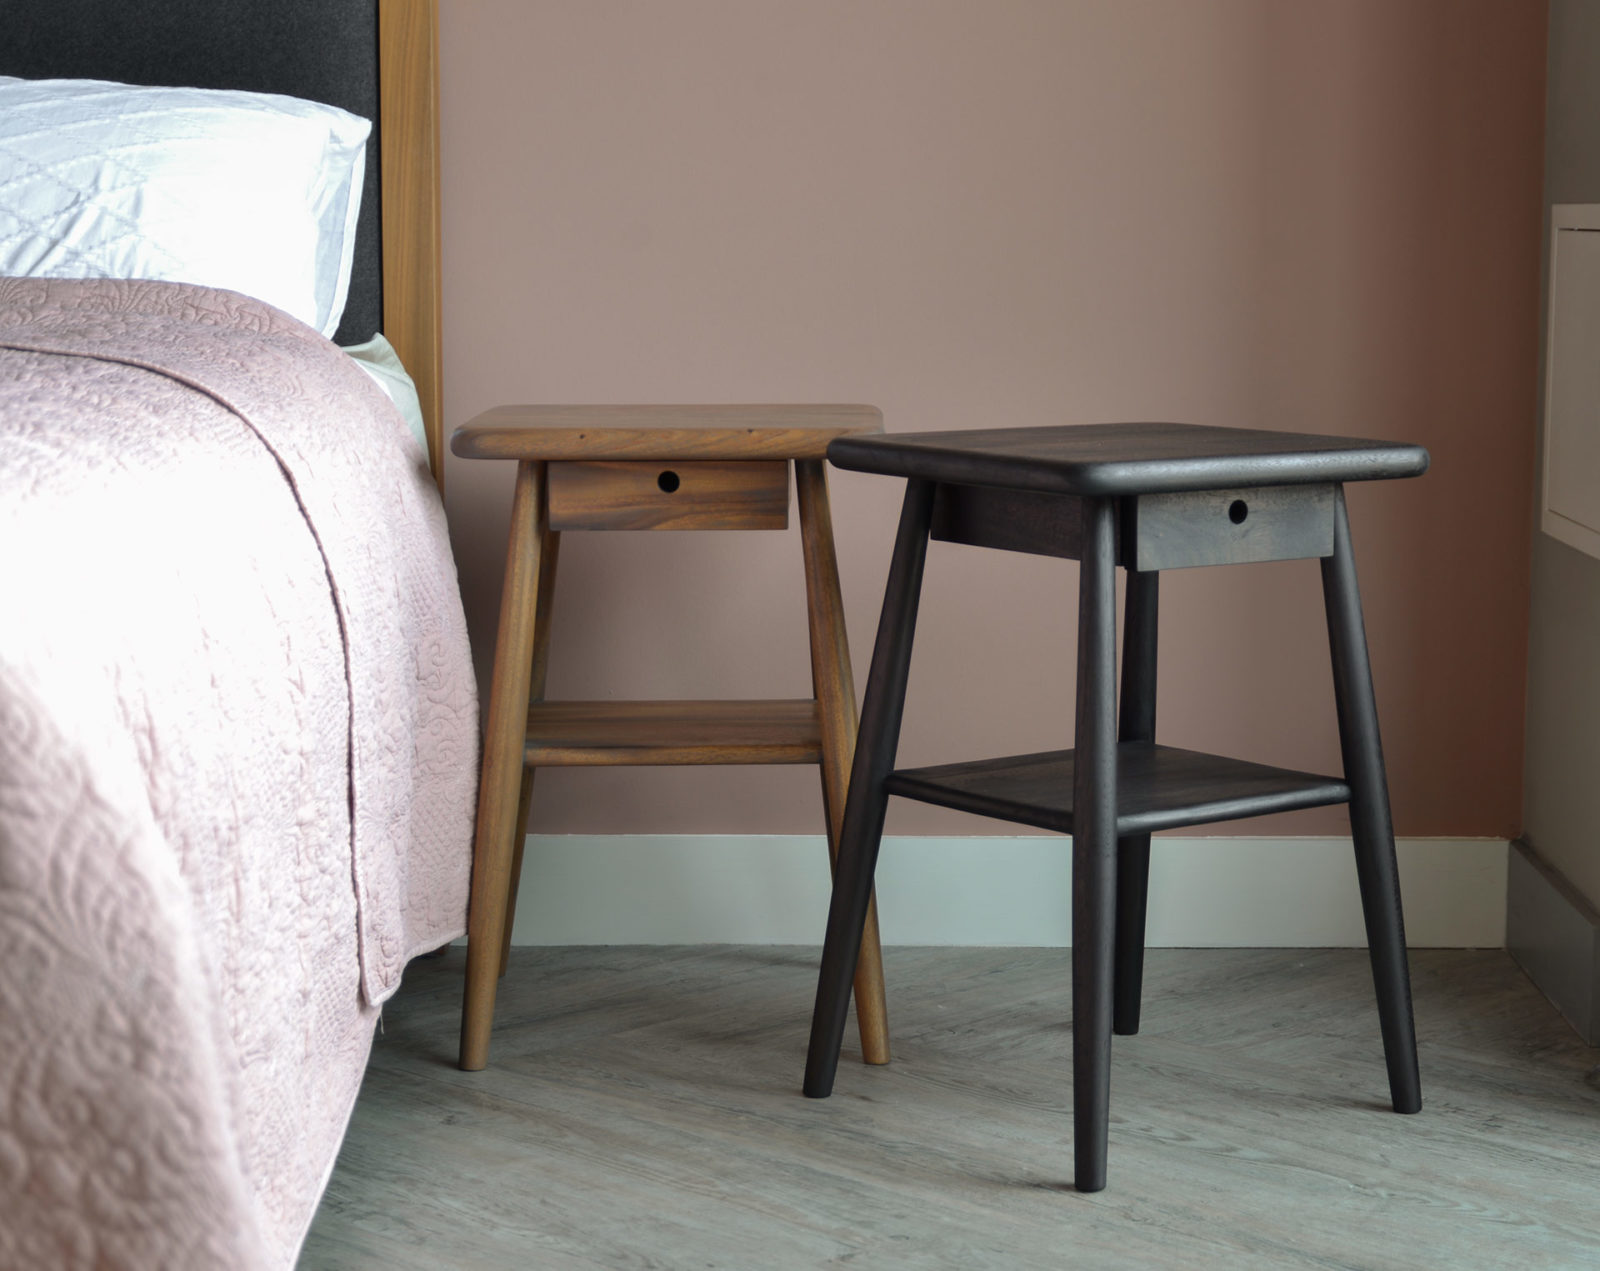 Meh Wood Bedside Tables - mid century look